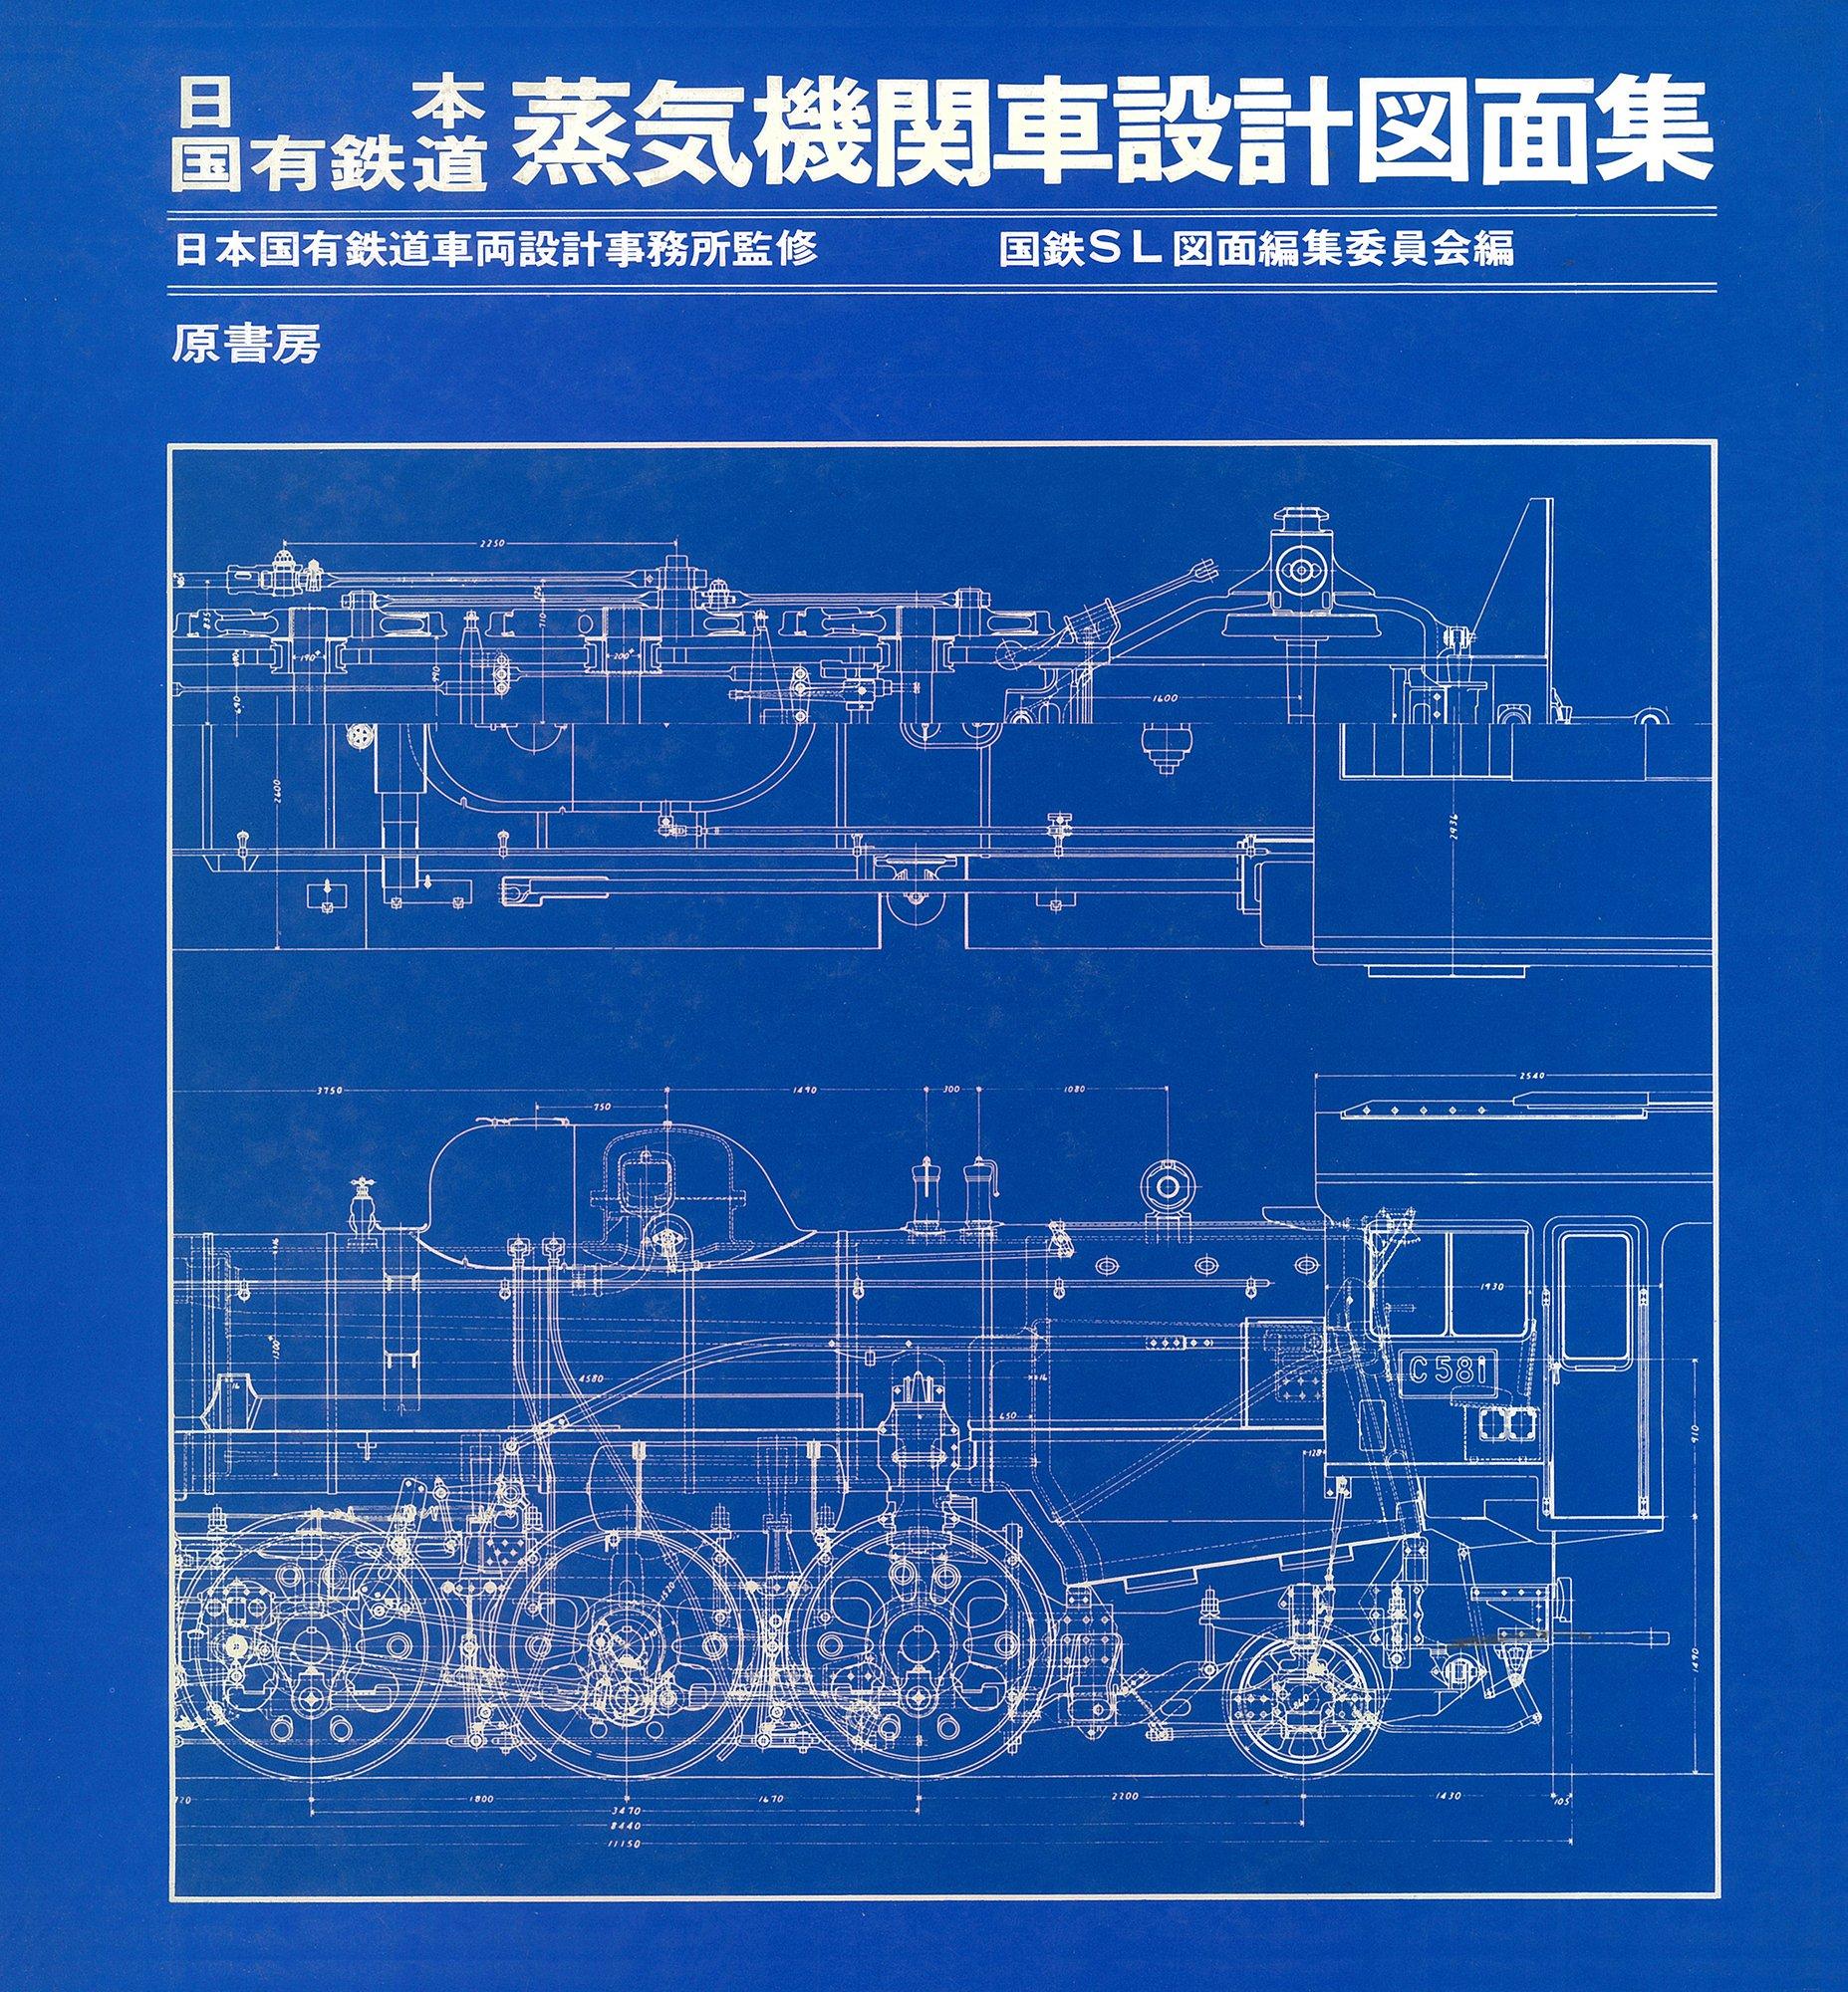 Japan National Railway Steam Locomotive Design Drawing